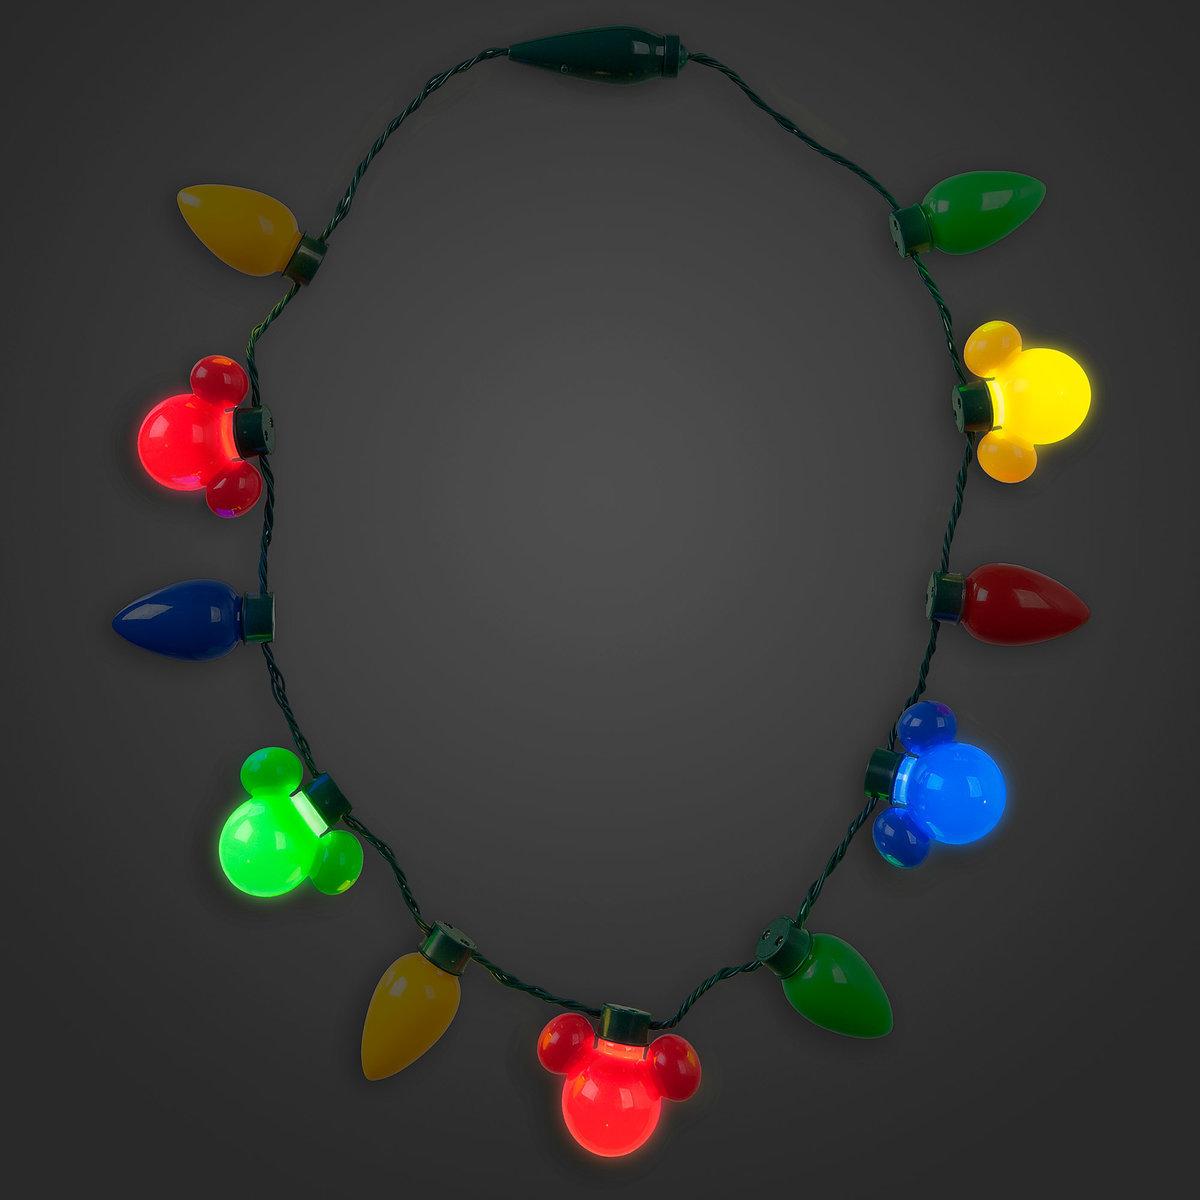 Disney Light Up Necklace Happy Holidays Christmas Lights